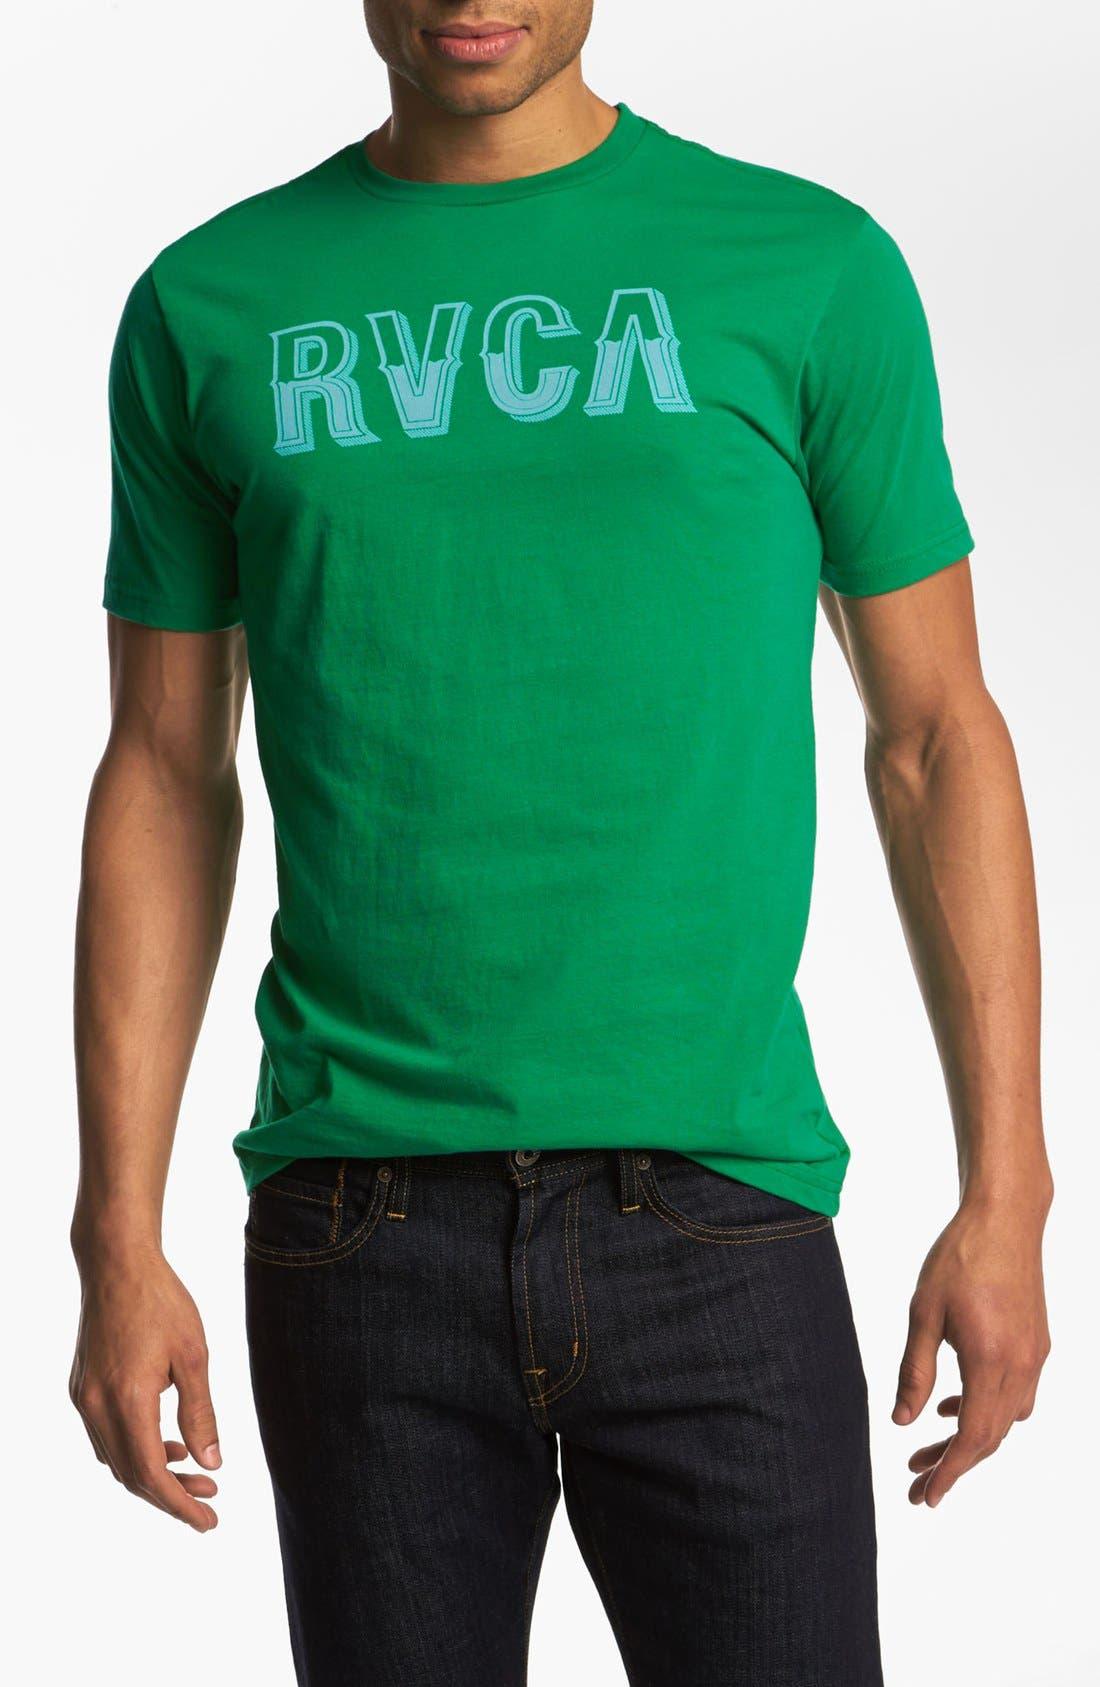 Main Image - RVCA 'Vintage' Graphic T-Shirt